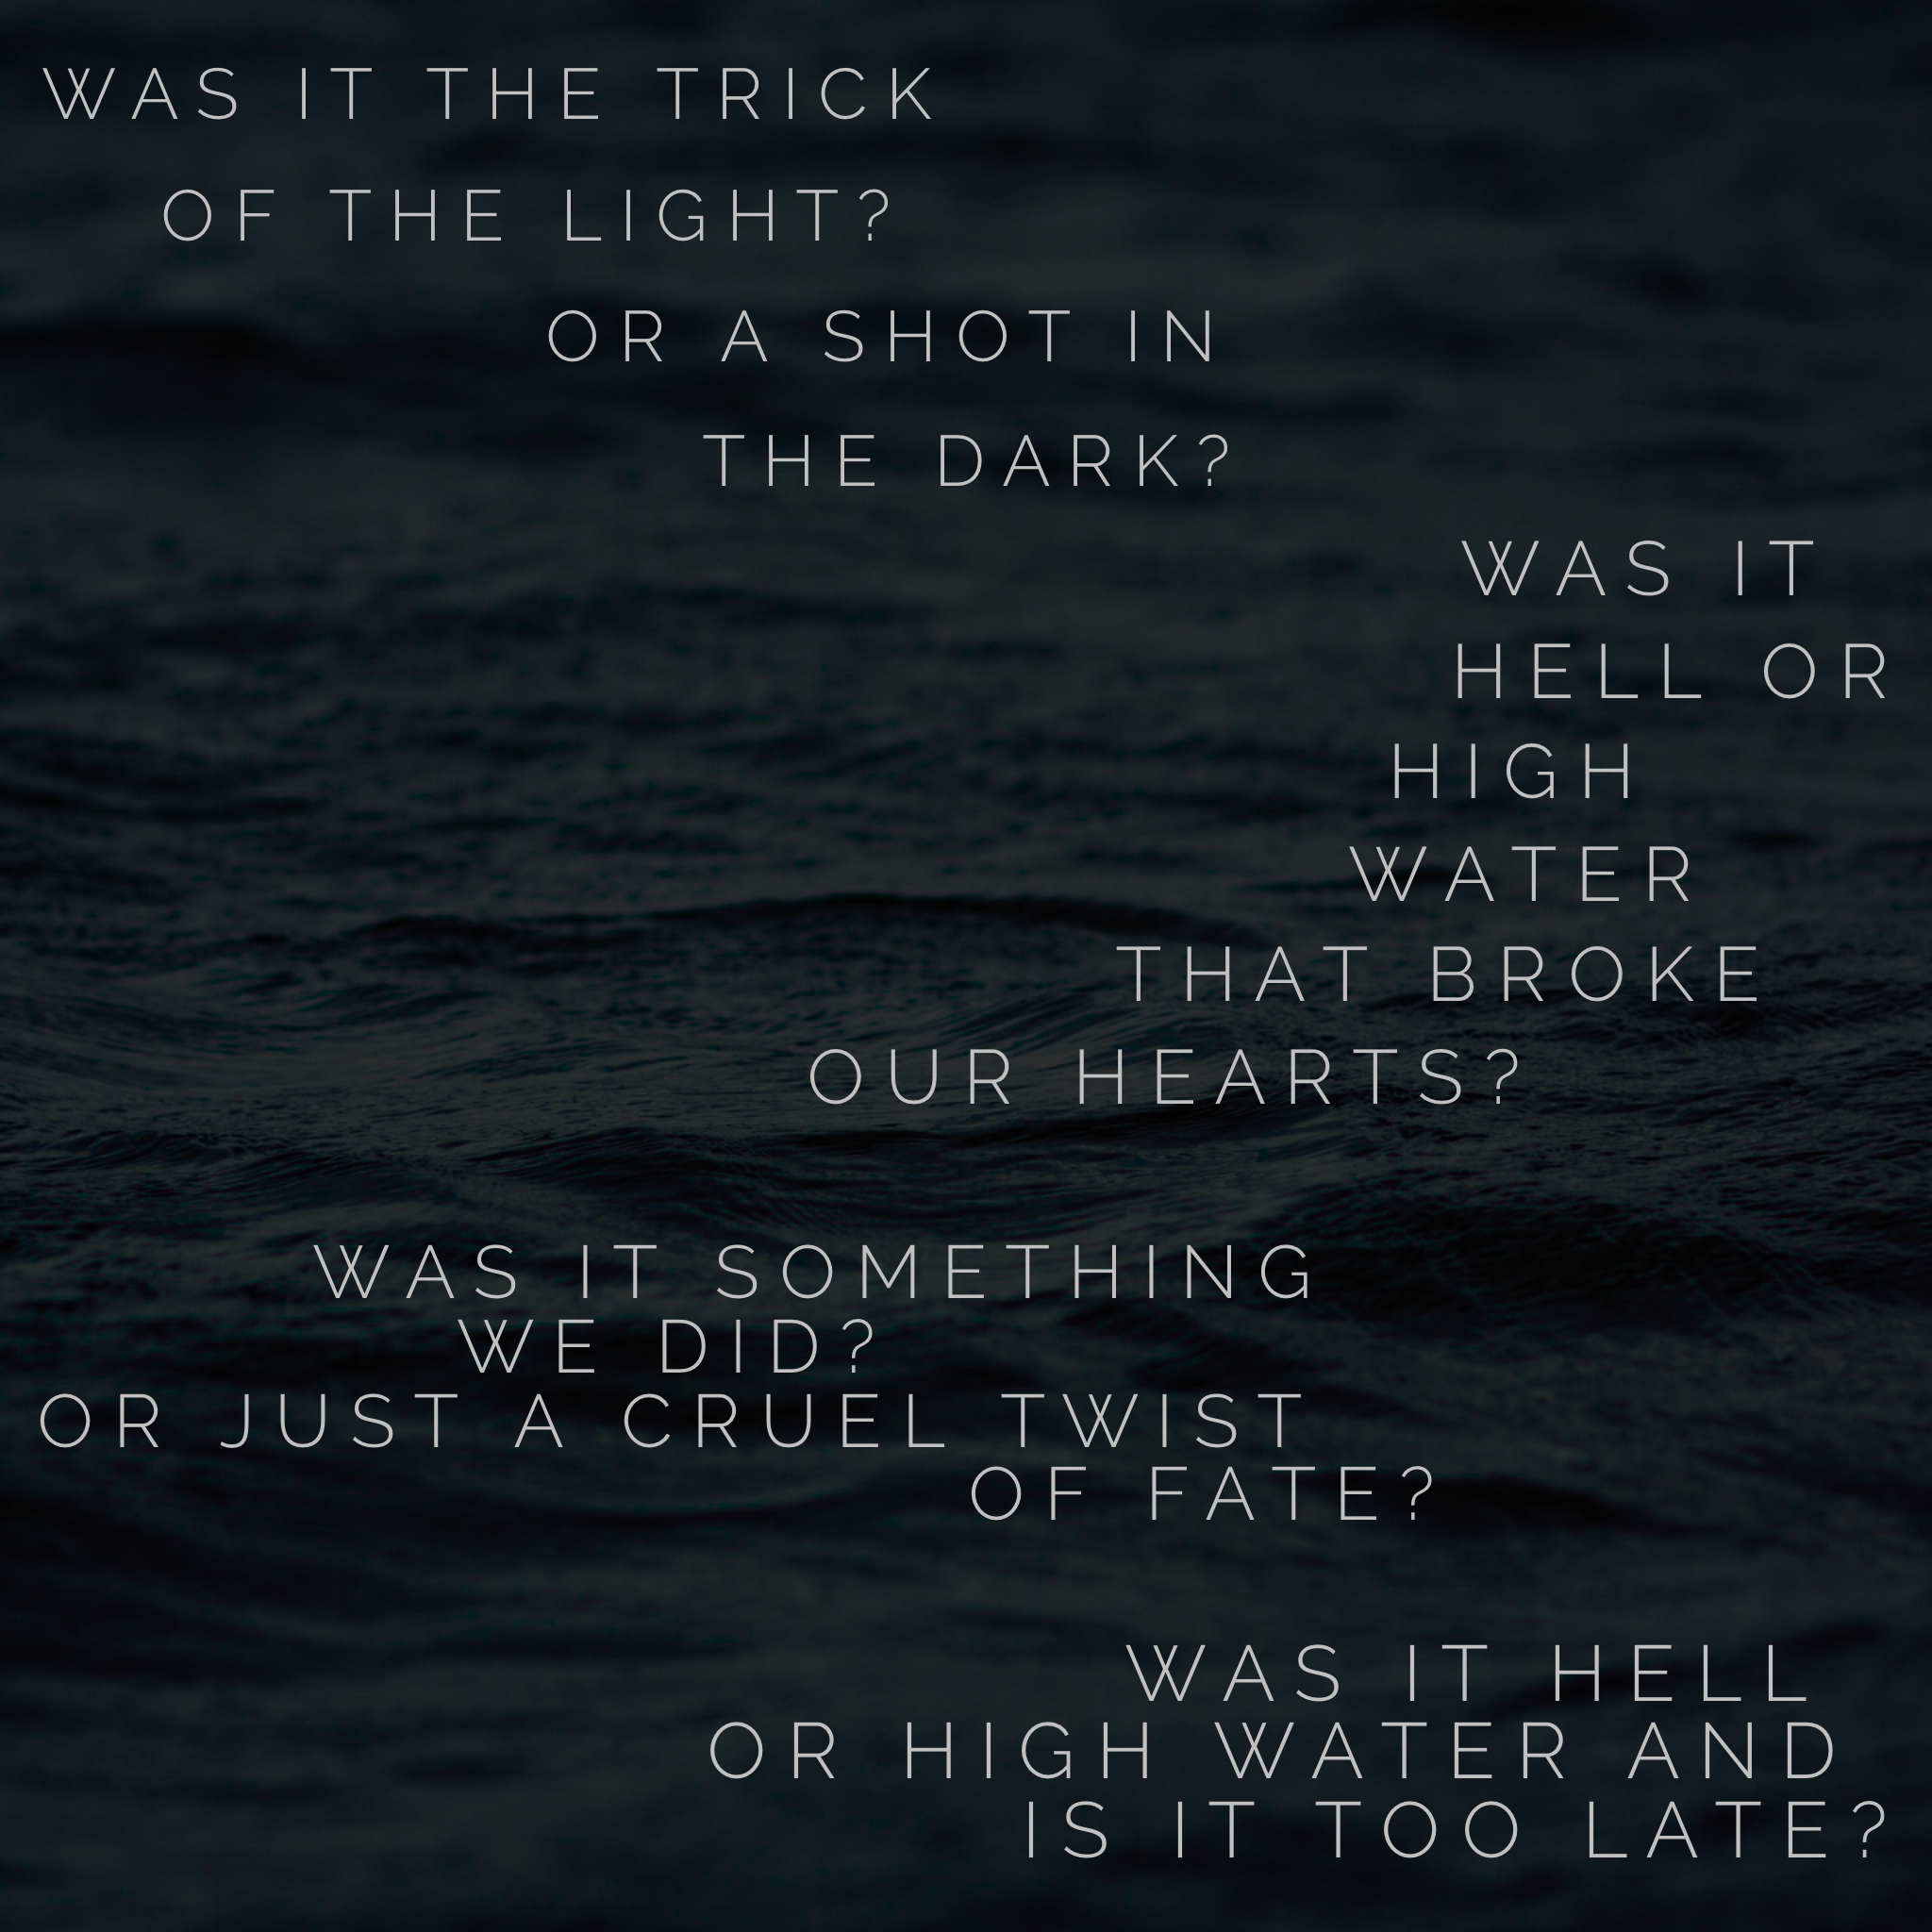 hell or high water lyrics passenger